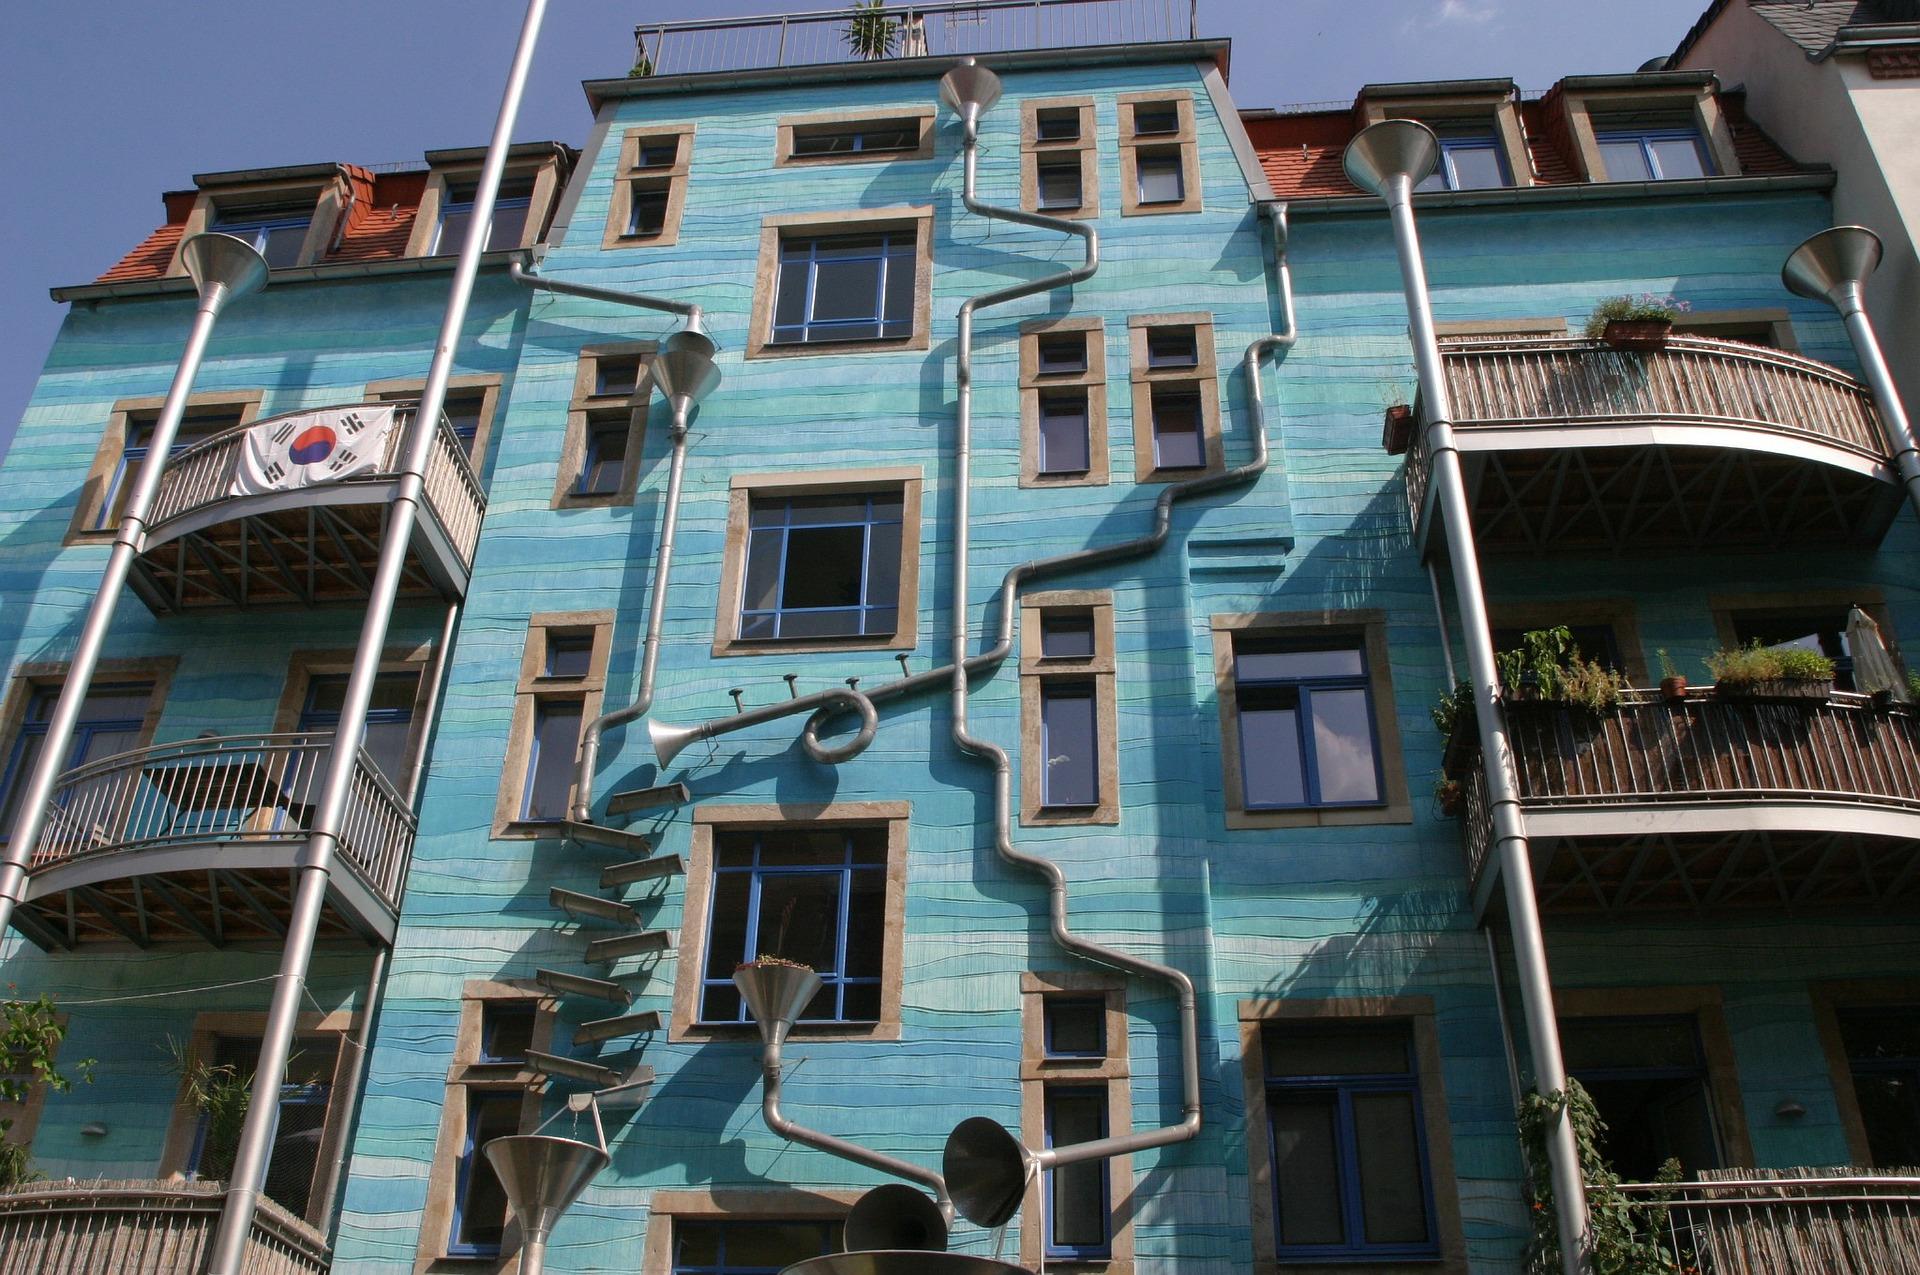 Häuserfassade in Dresden